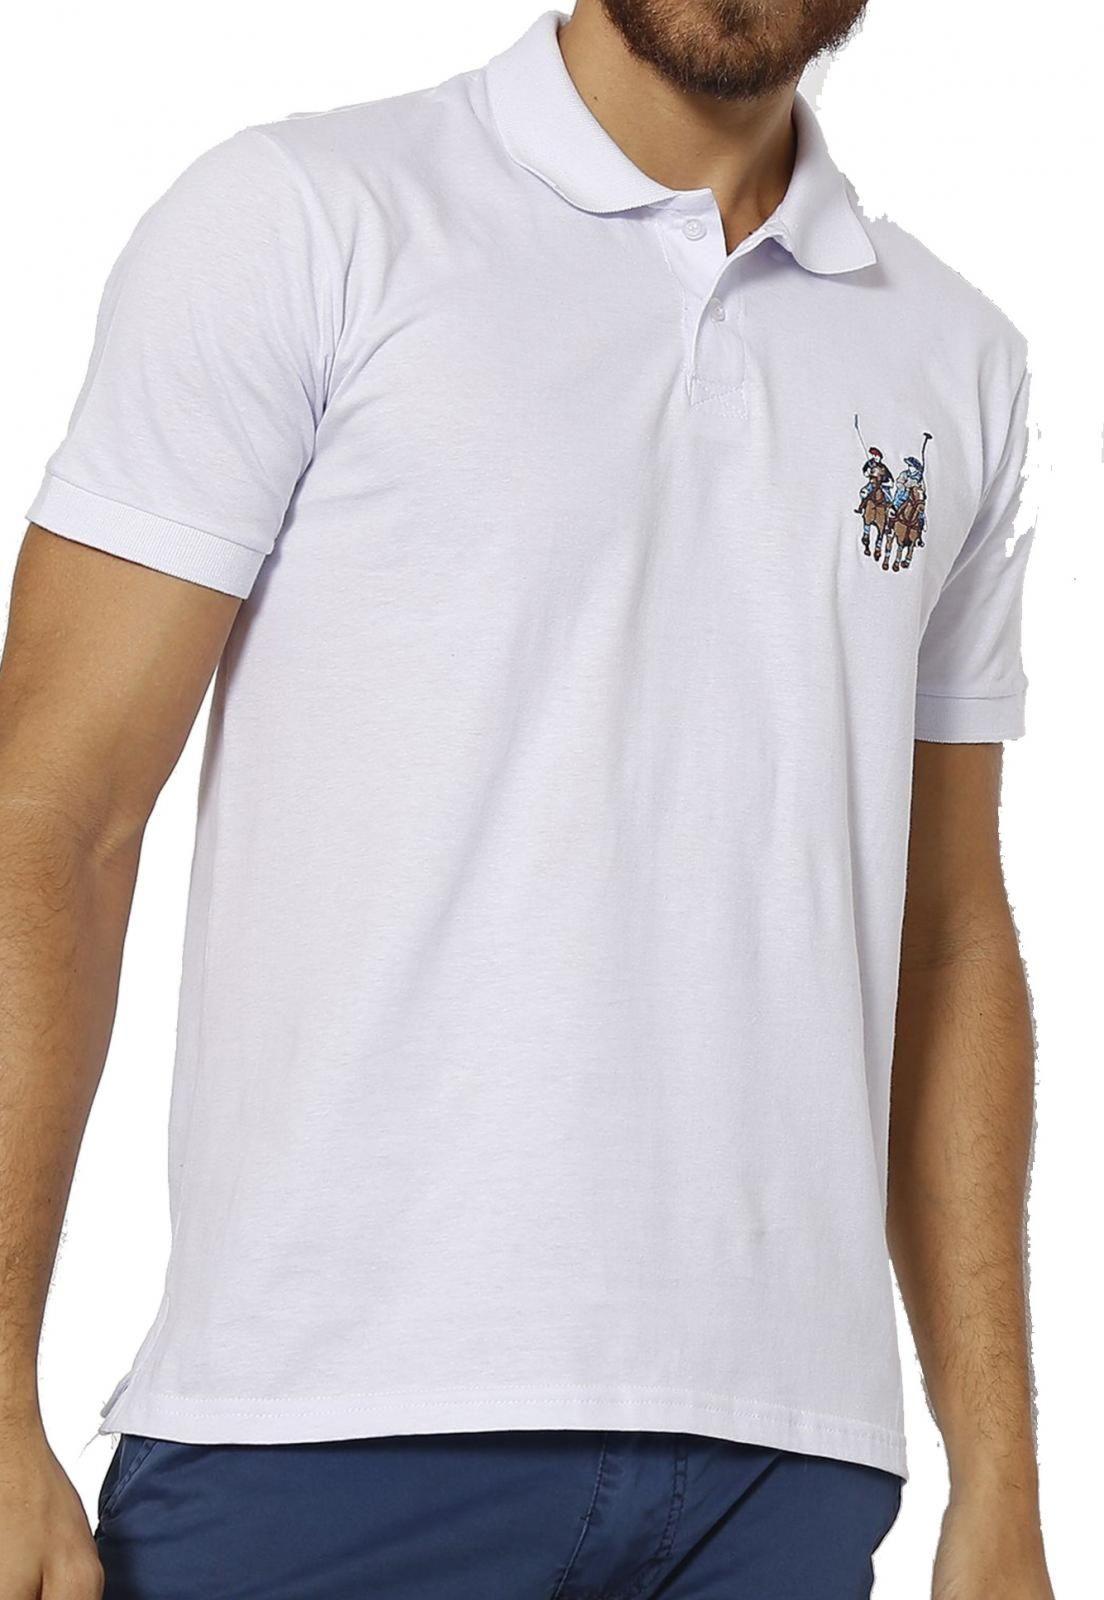 Camisa Polo Ralph Lauren Original Masculina Frete Grátis